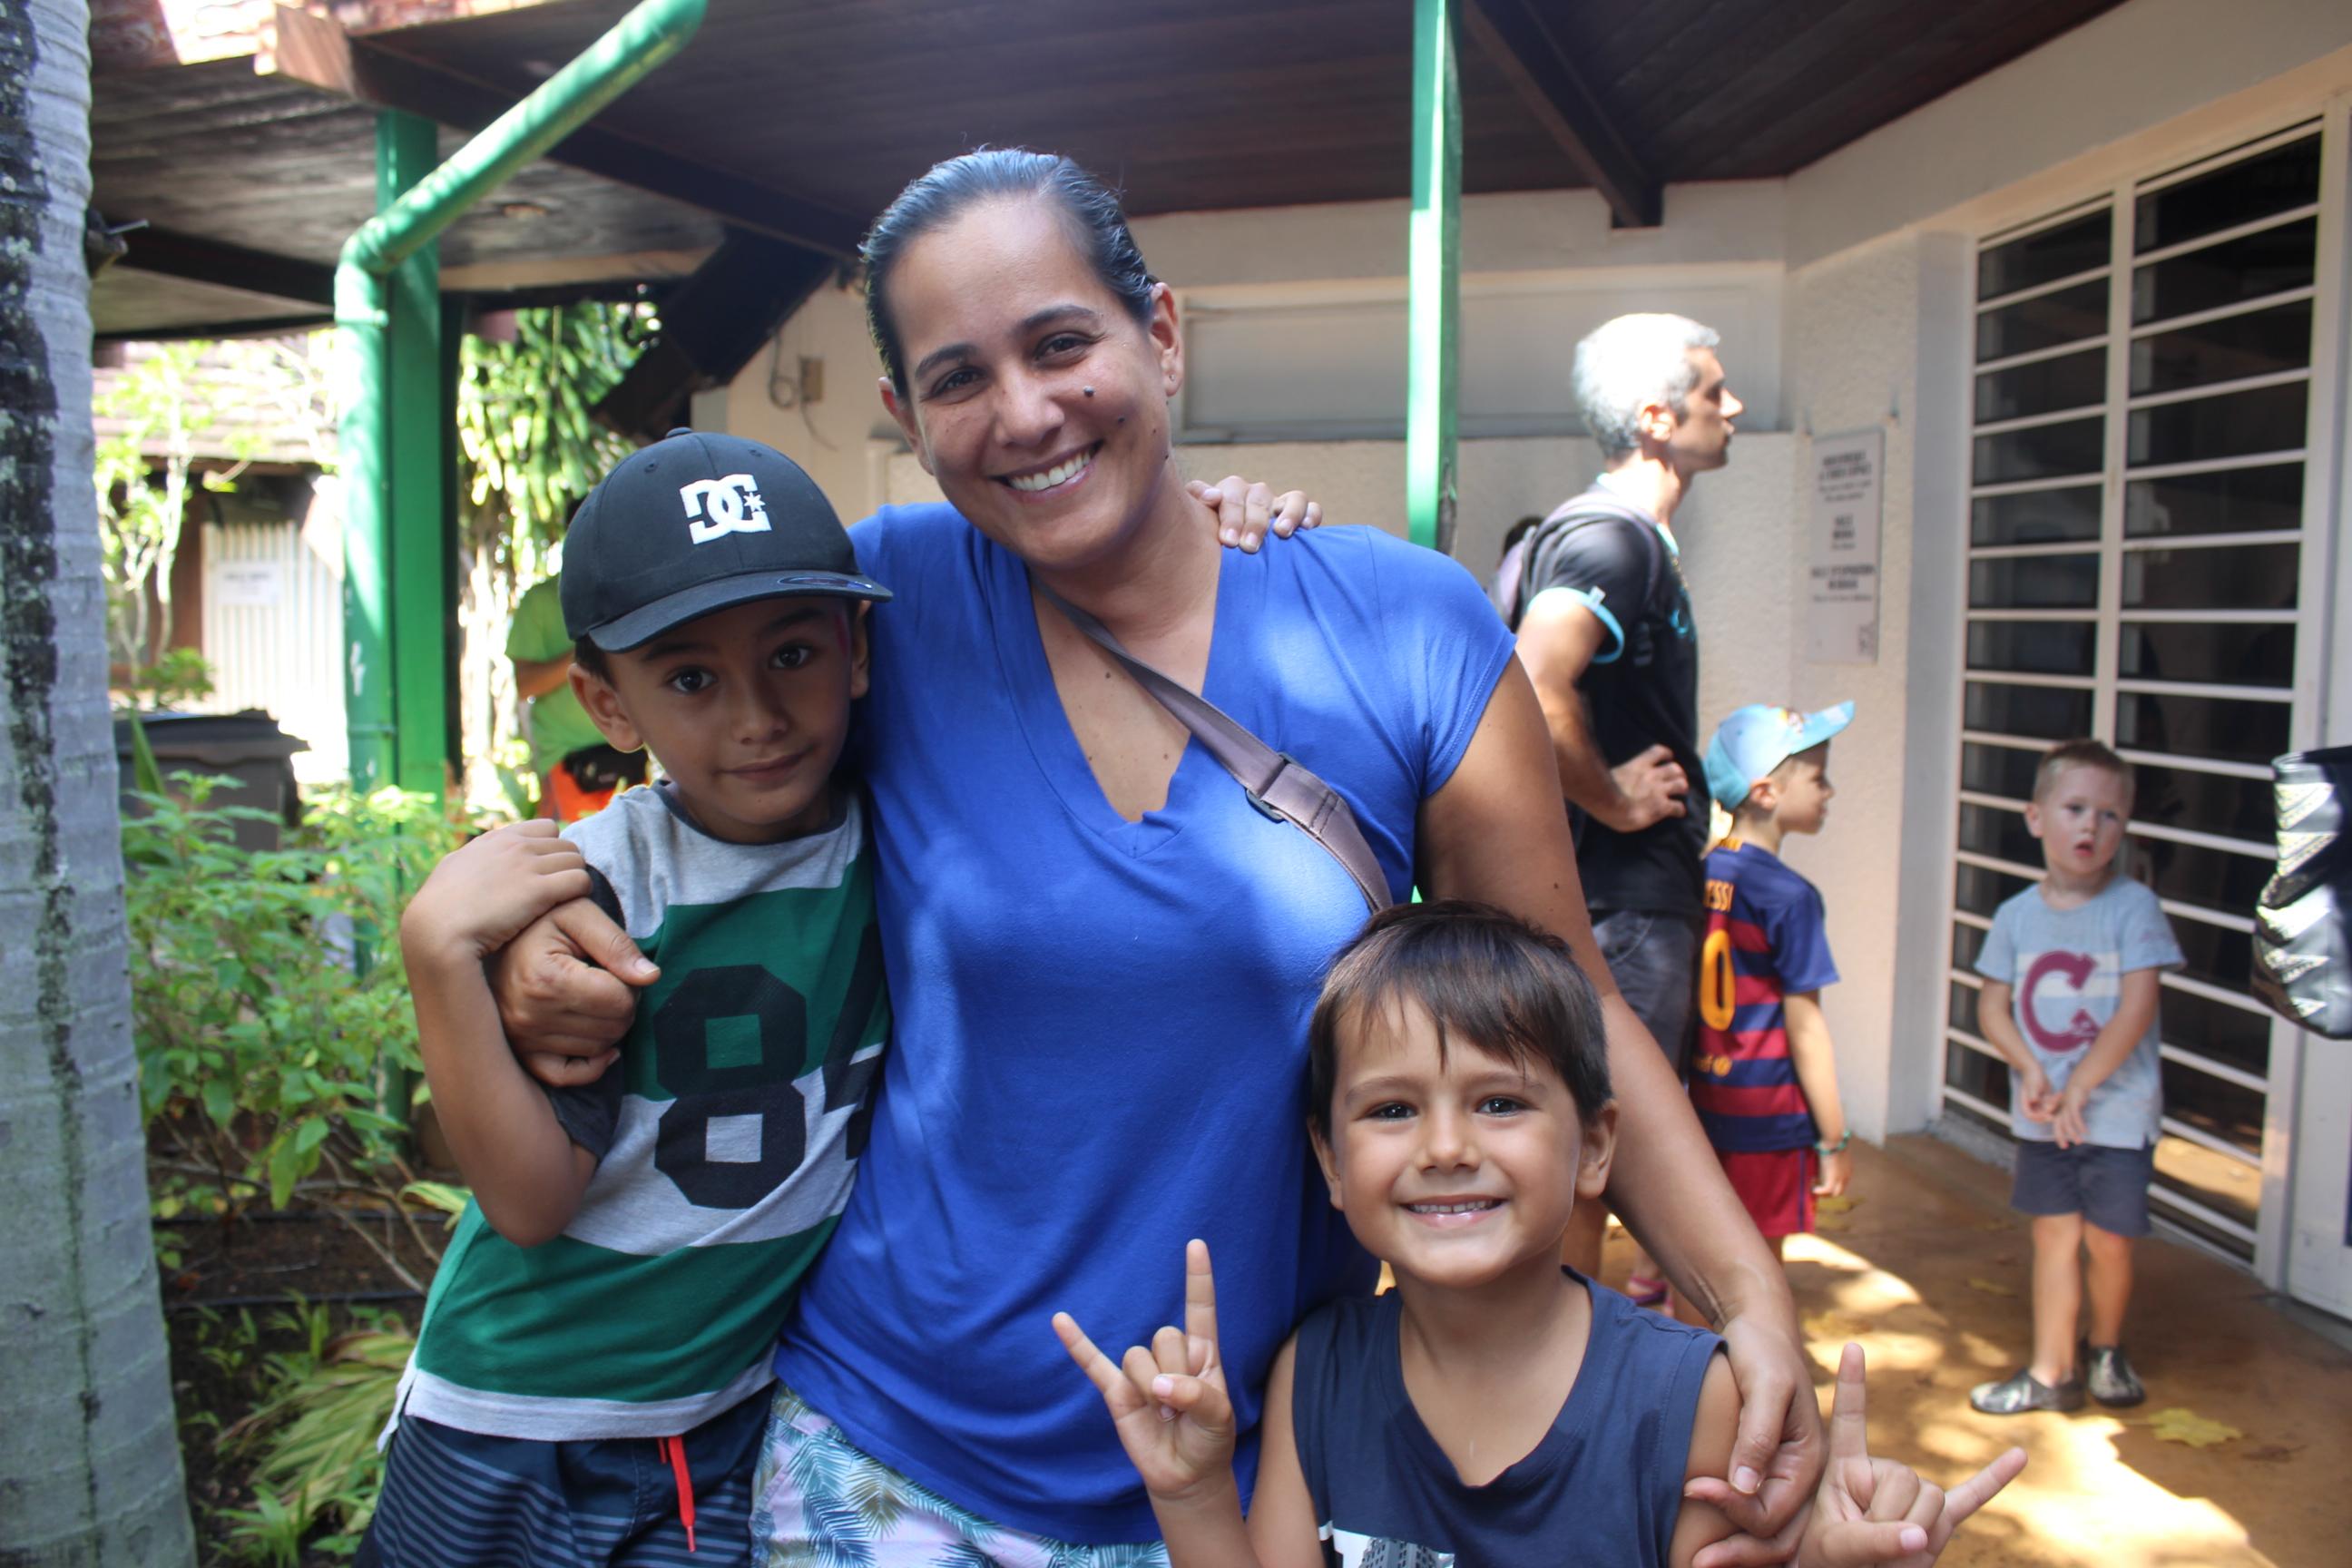 Timiri et ses deux petits neveux Herearii et Matahi.